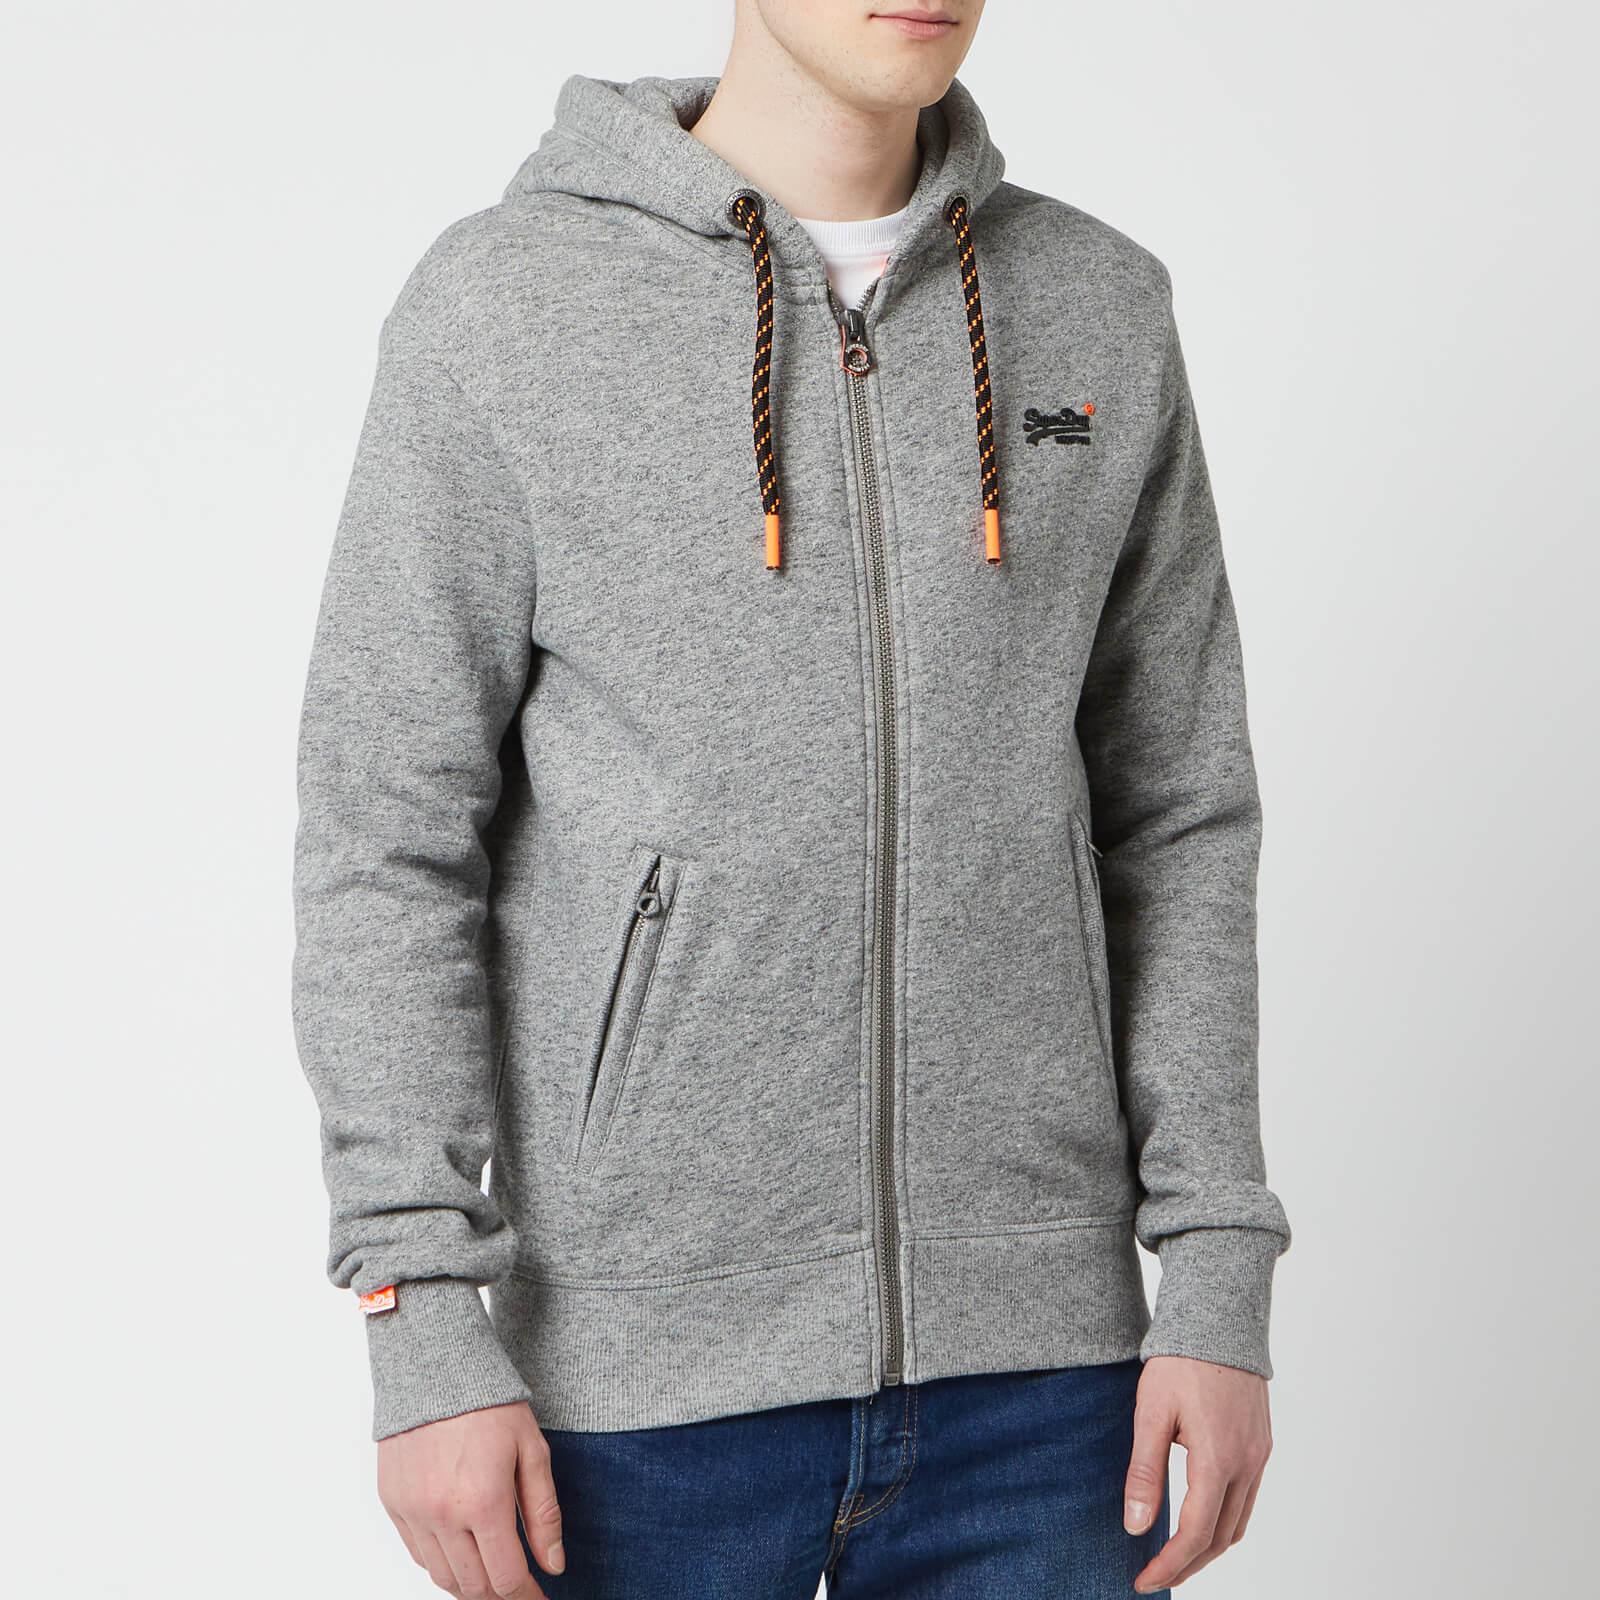 429af3a9df47 Superdry Men's Orange Label Hyper Pop Zip Hoody - Portland Charcoal Grit  Mens Clothing   TheHut.com